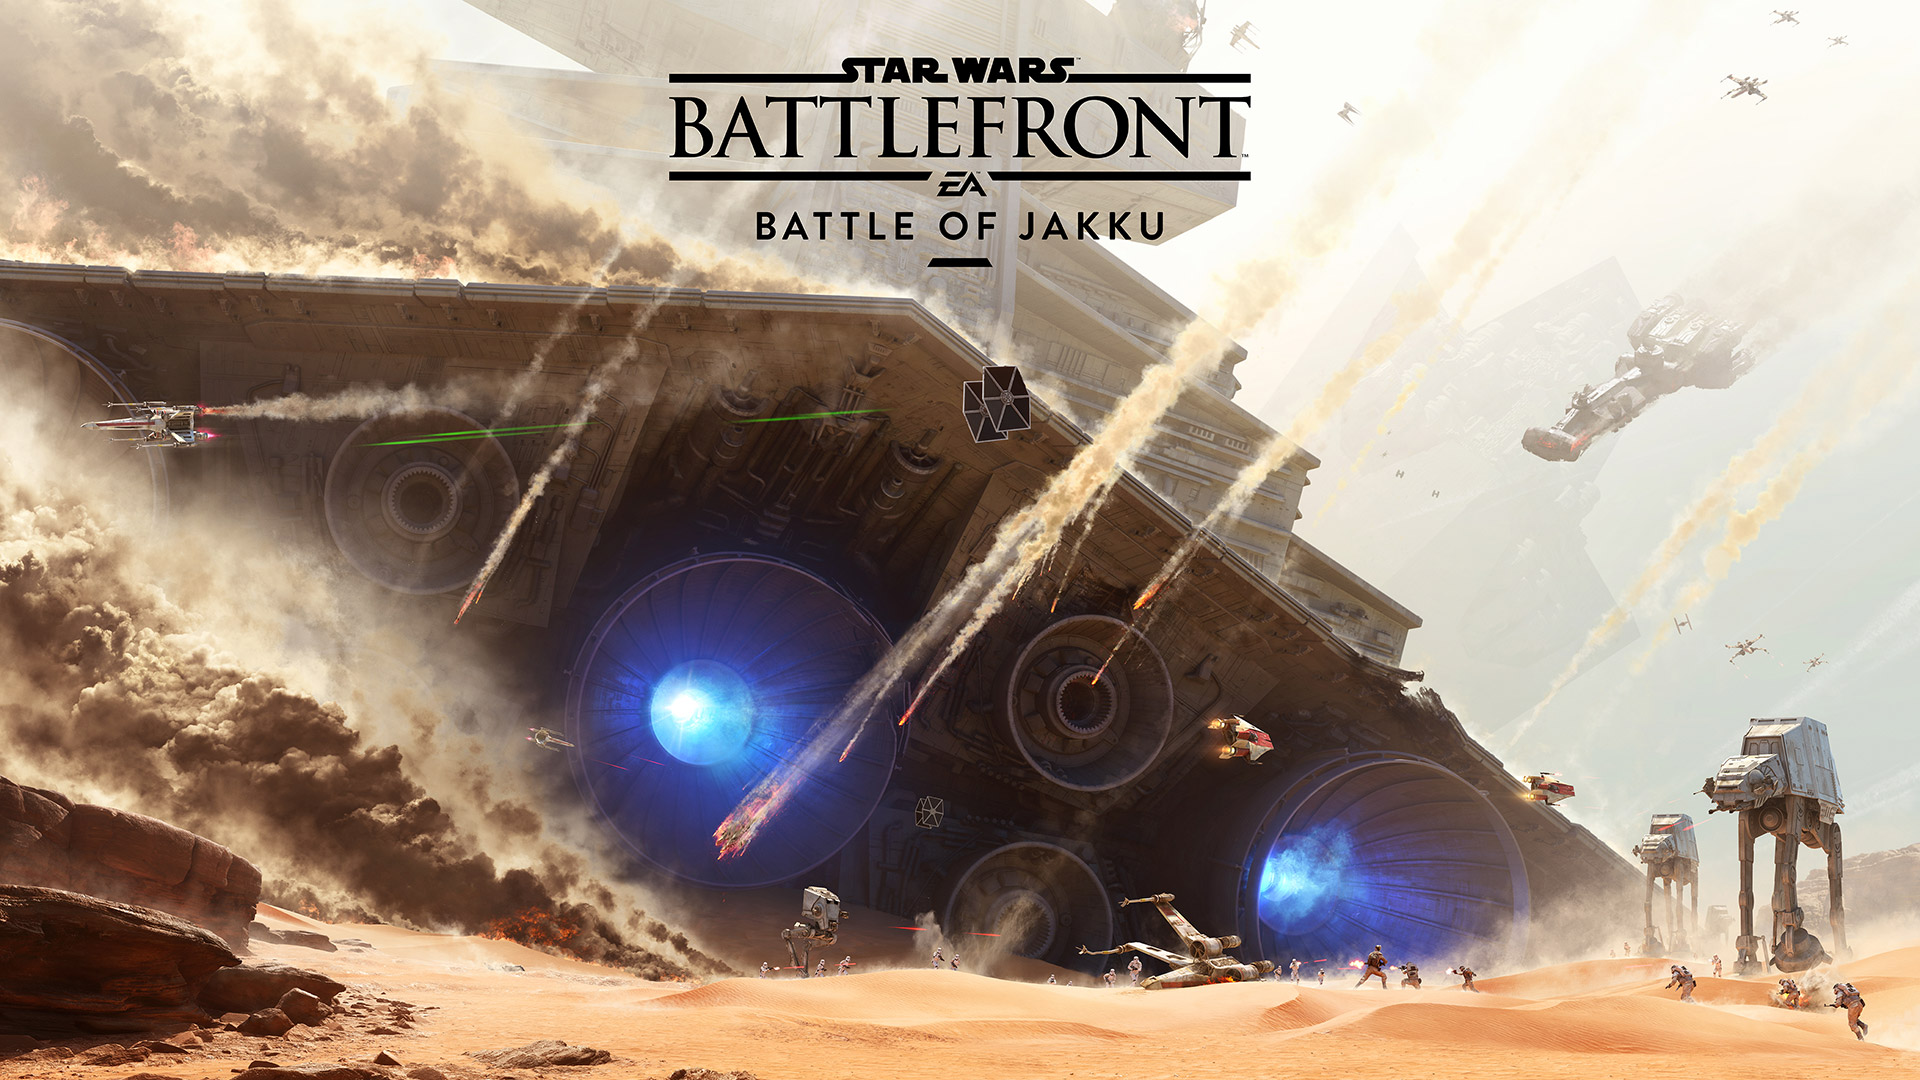 Star Wars Battlefront battle of jakku batalla de jakku dlc